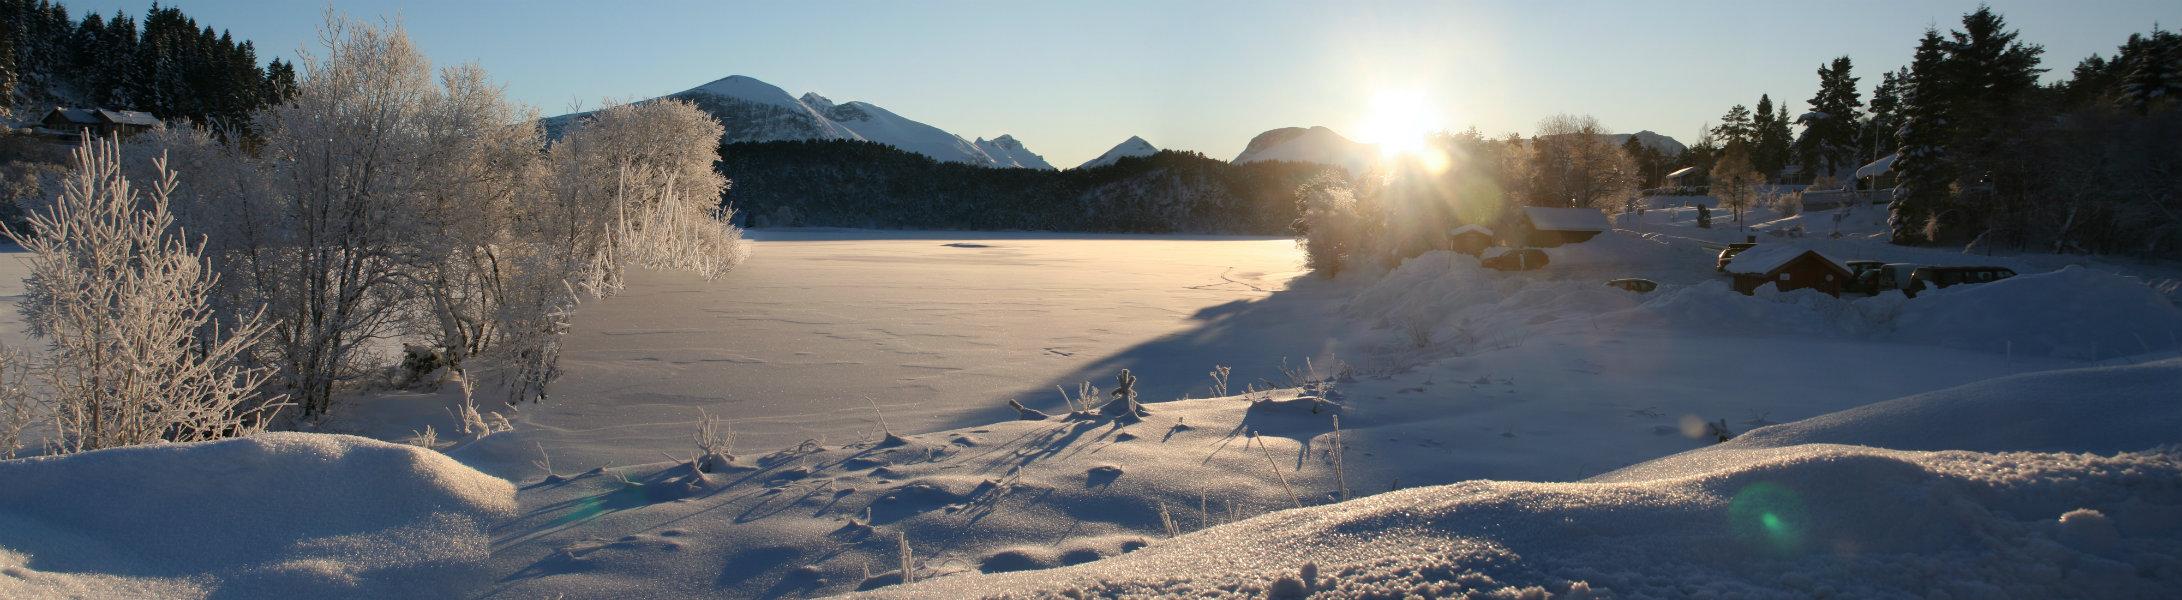 Mausavatnet vinter.jpg